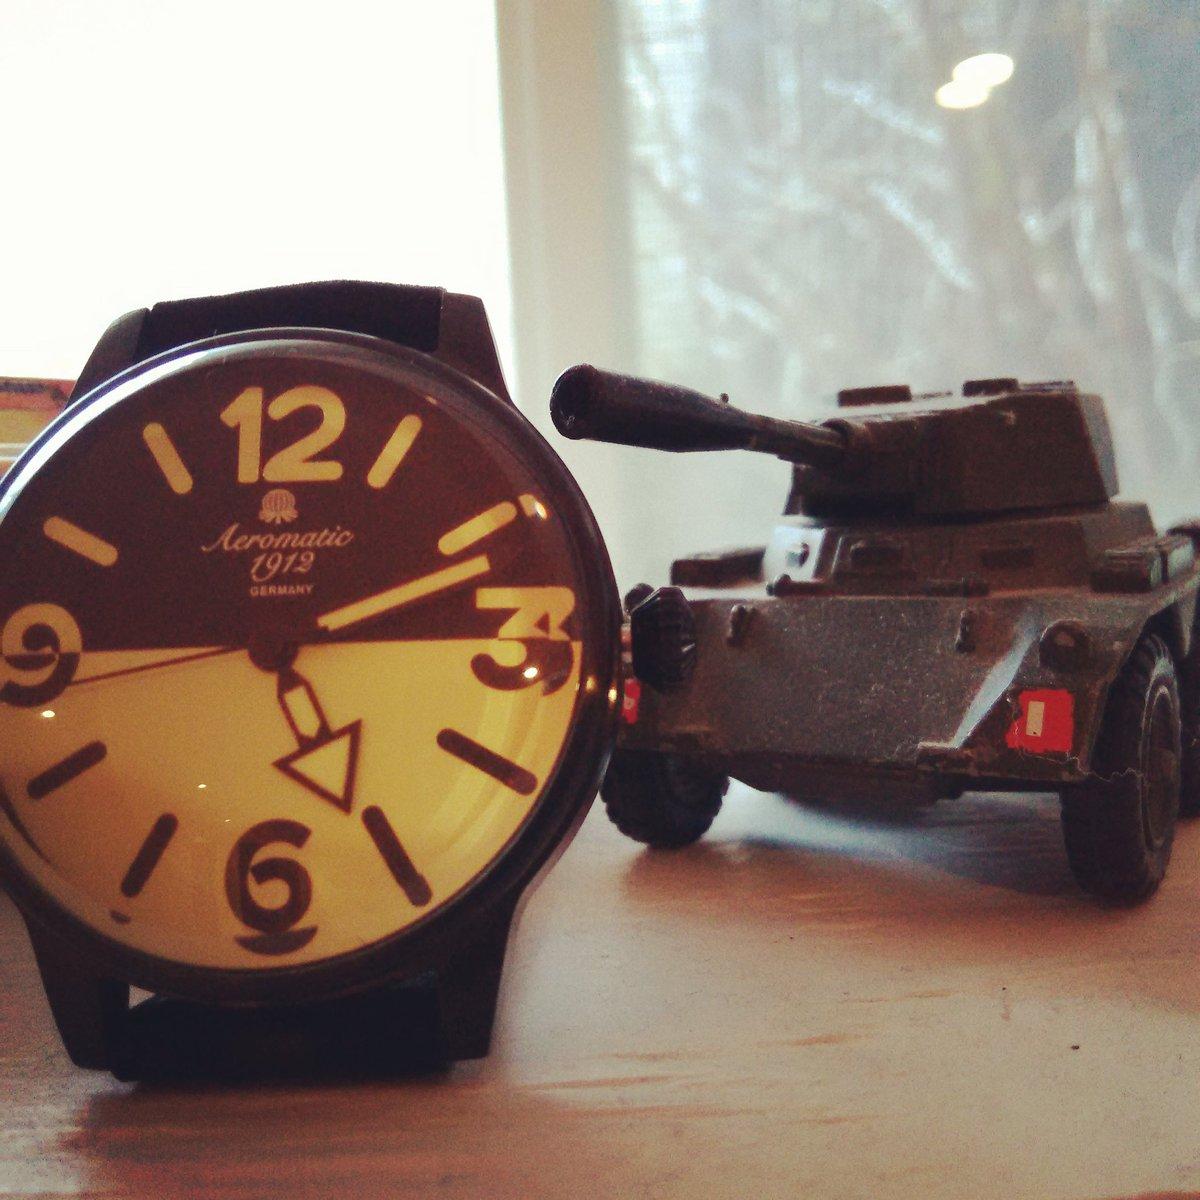 Aeromatic German Watch With Army Miniature Tank Few Left At 189 Uigwatch Pictwitter Gq5DeqOXmm